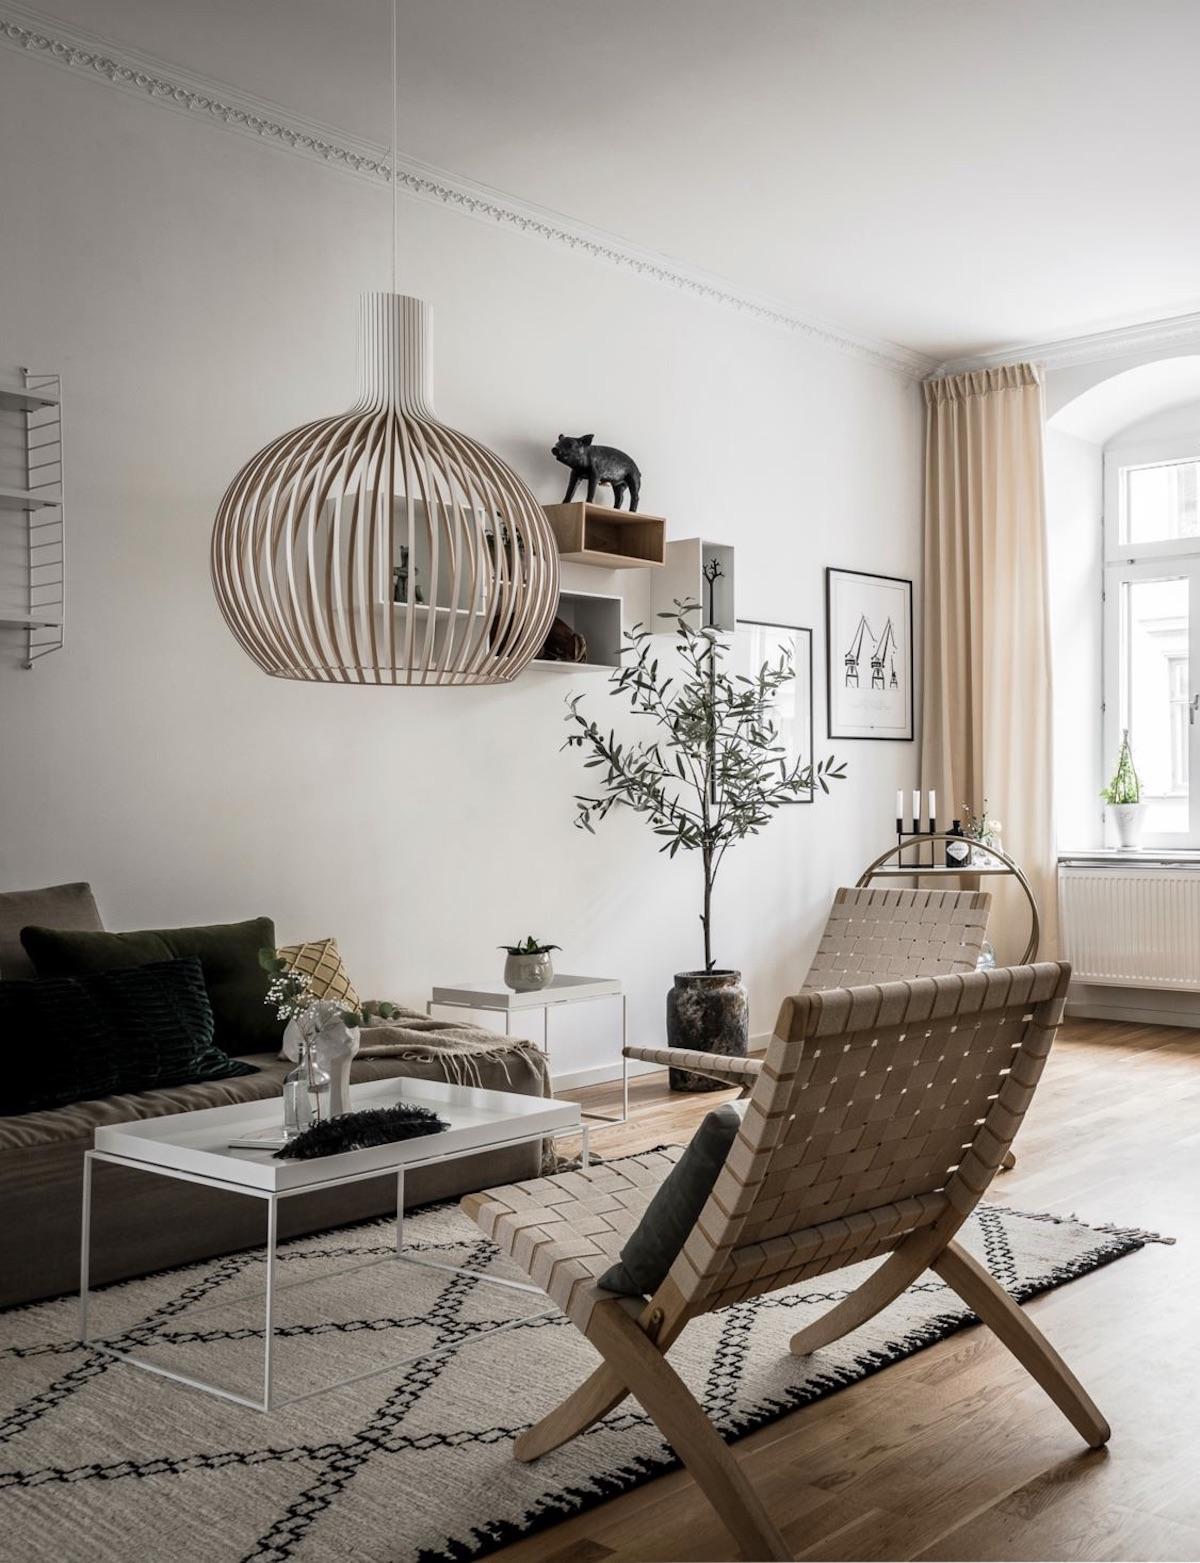 salon nordique Secto Design Octo Suspension bois arrondi rond